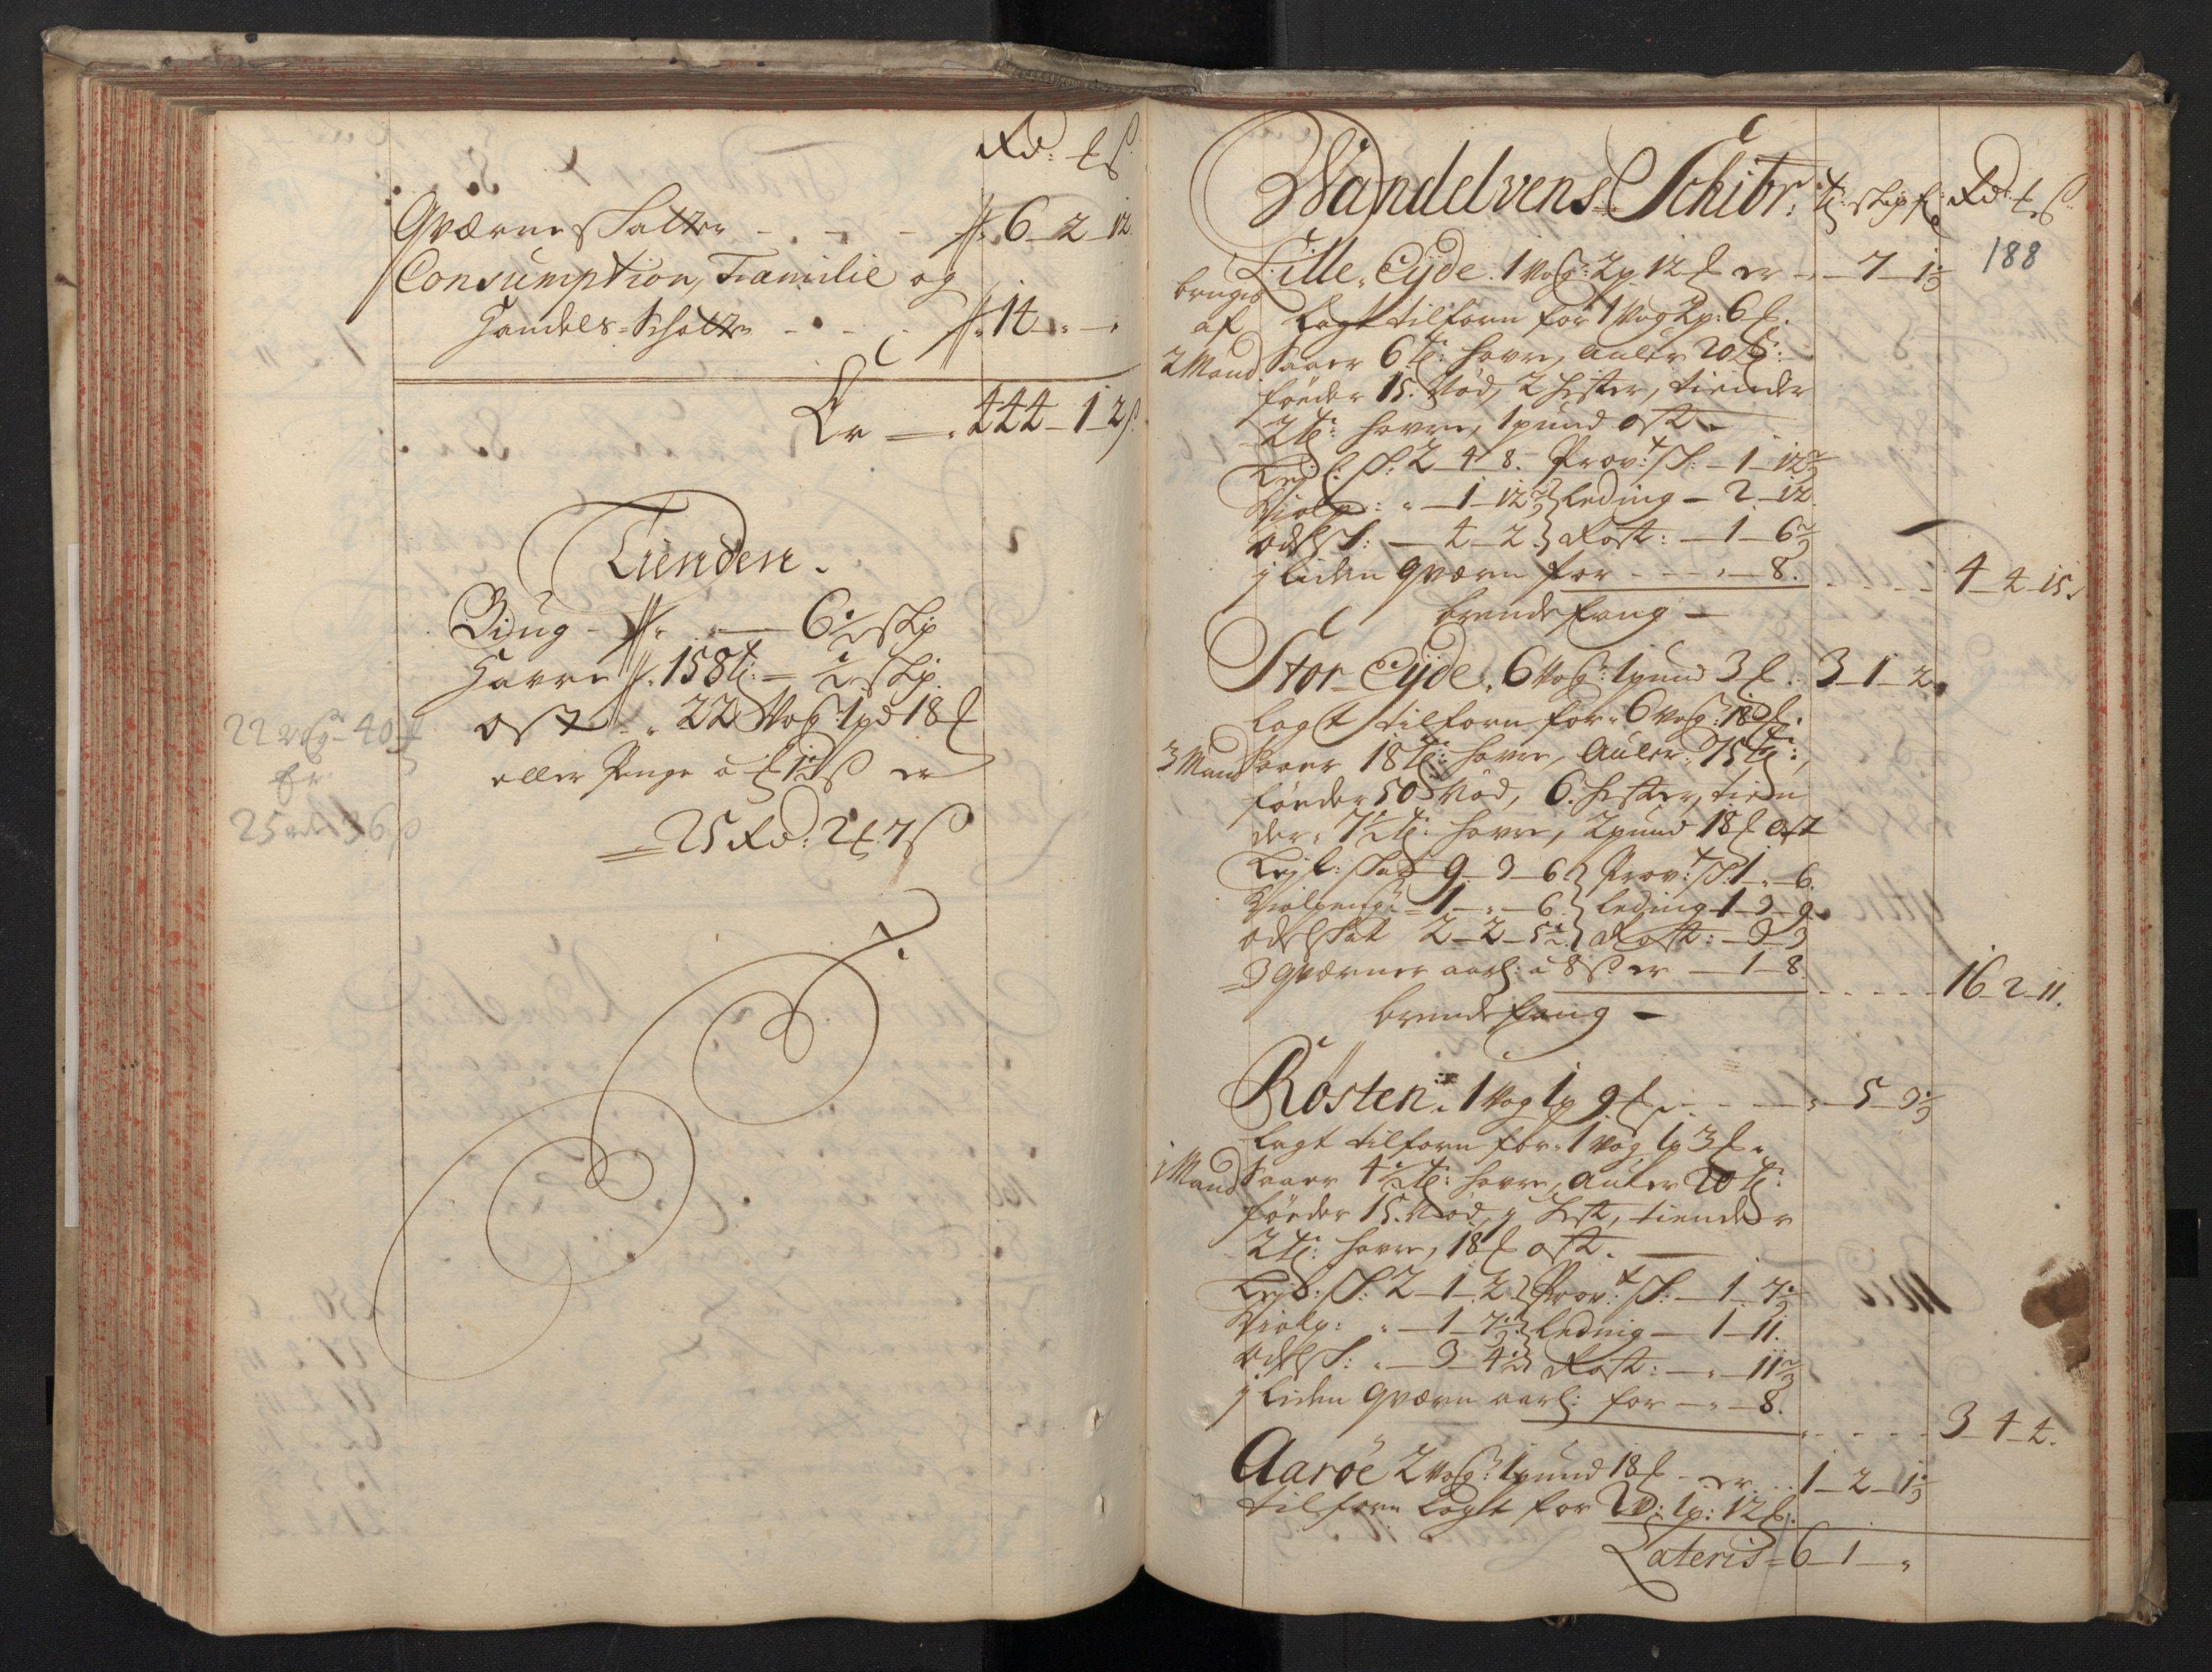 RA, Rentekammeret inntil 1814, Realistisk ordnet avdeling, N/Nb/Nbf/L0148: Sunnmøre, prøvematrikkel, 1714, s. 187b-188a